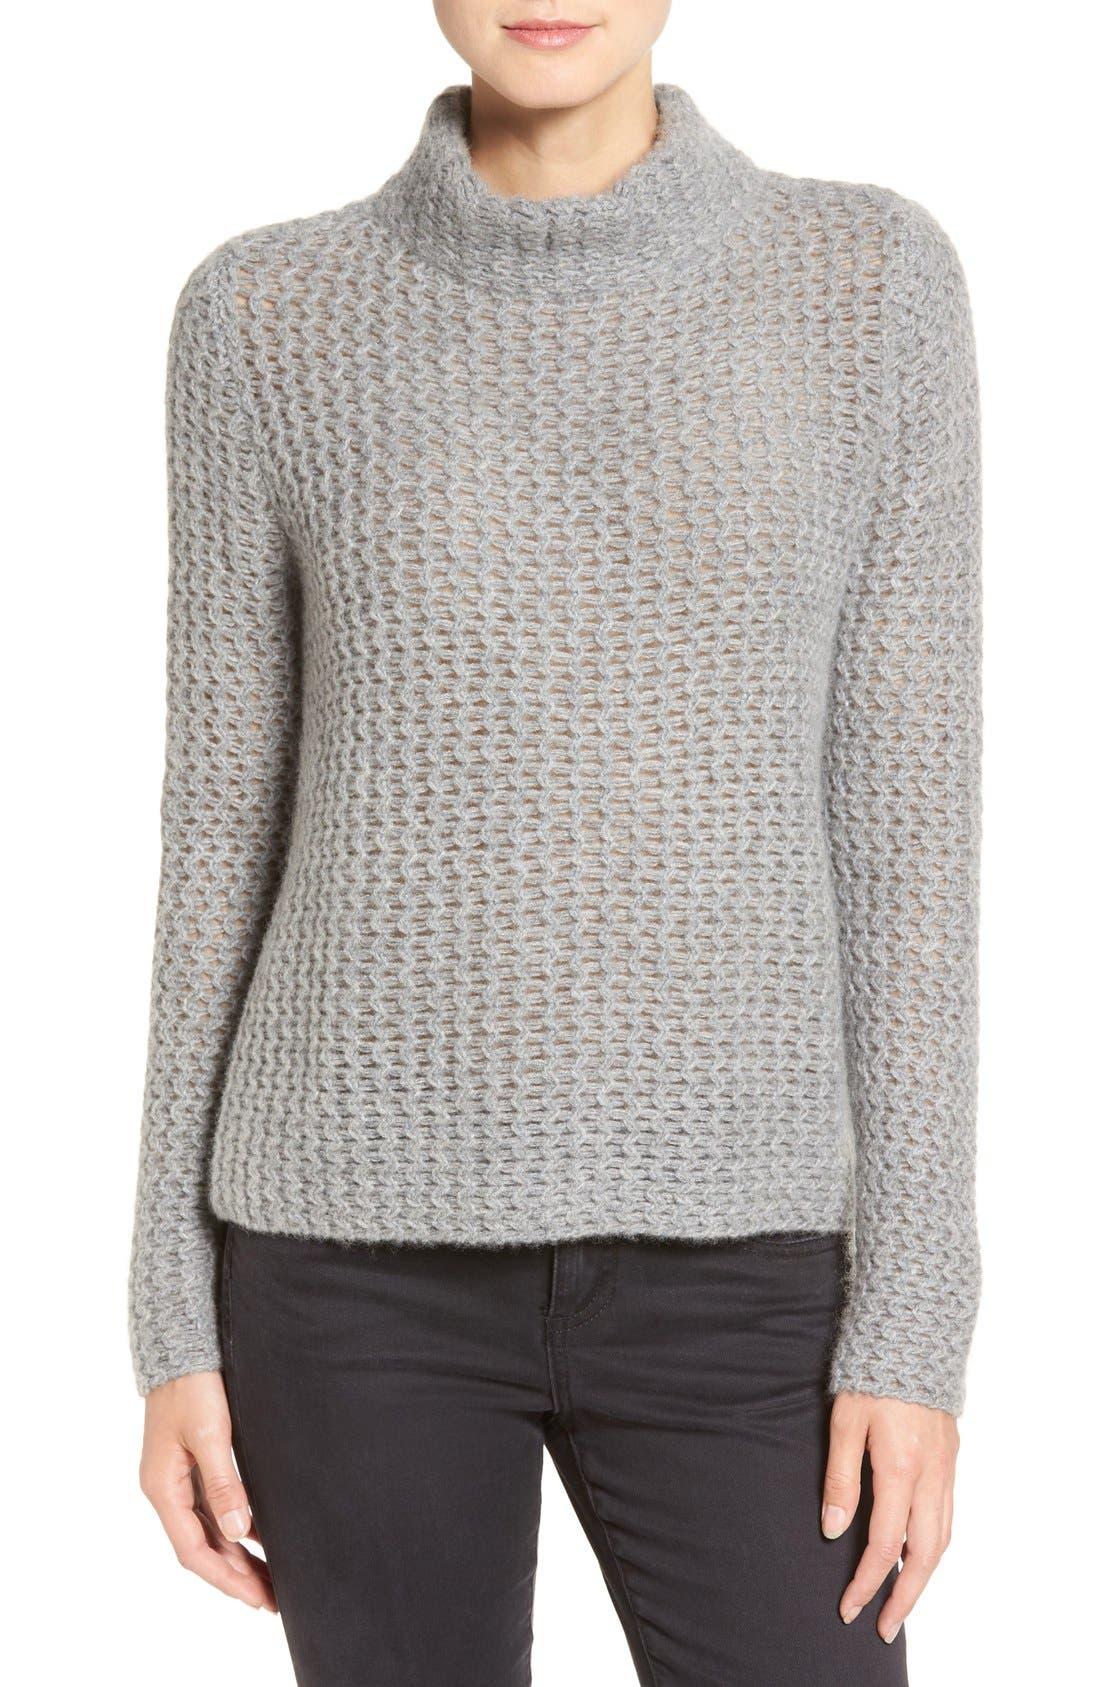 Stitch Detail Cashmere Mock Neck Sweater,                             Main thumbnail 1, color,                             030